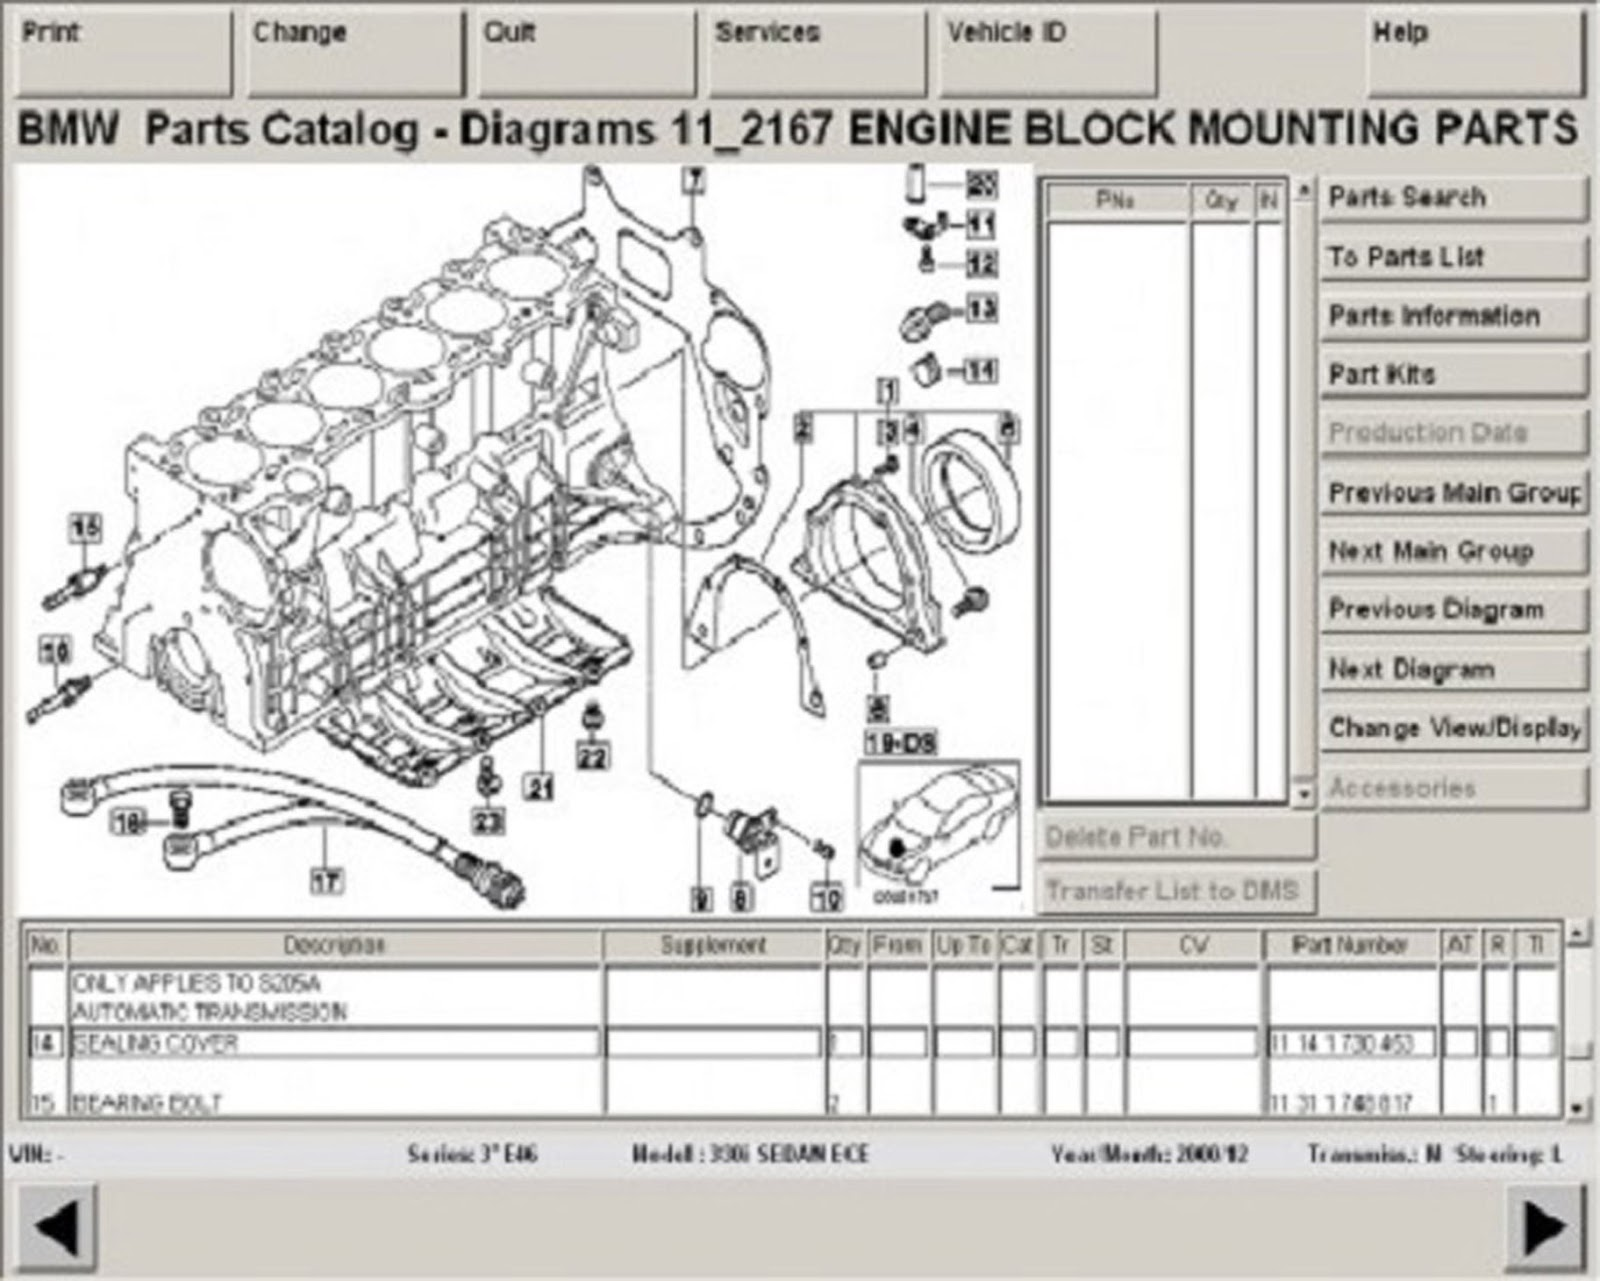 Bmw Tis Repair Manual E83 M30 Engine Diagram Dryer Wall Socket Wiring